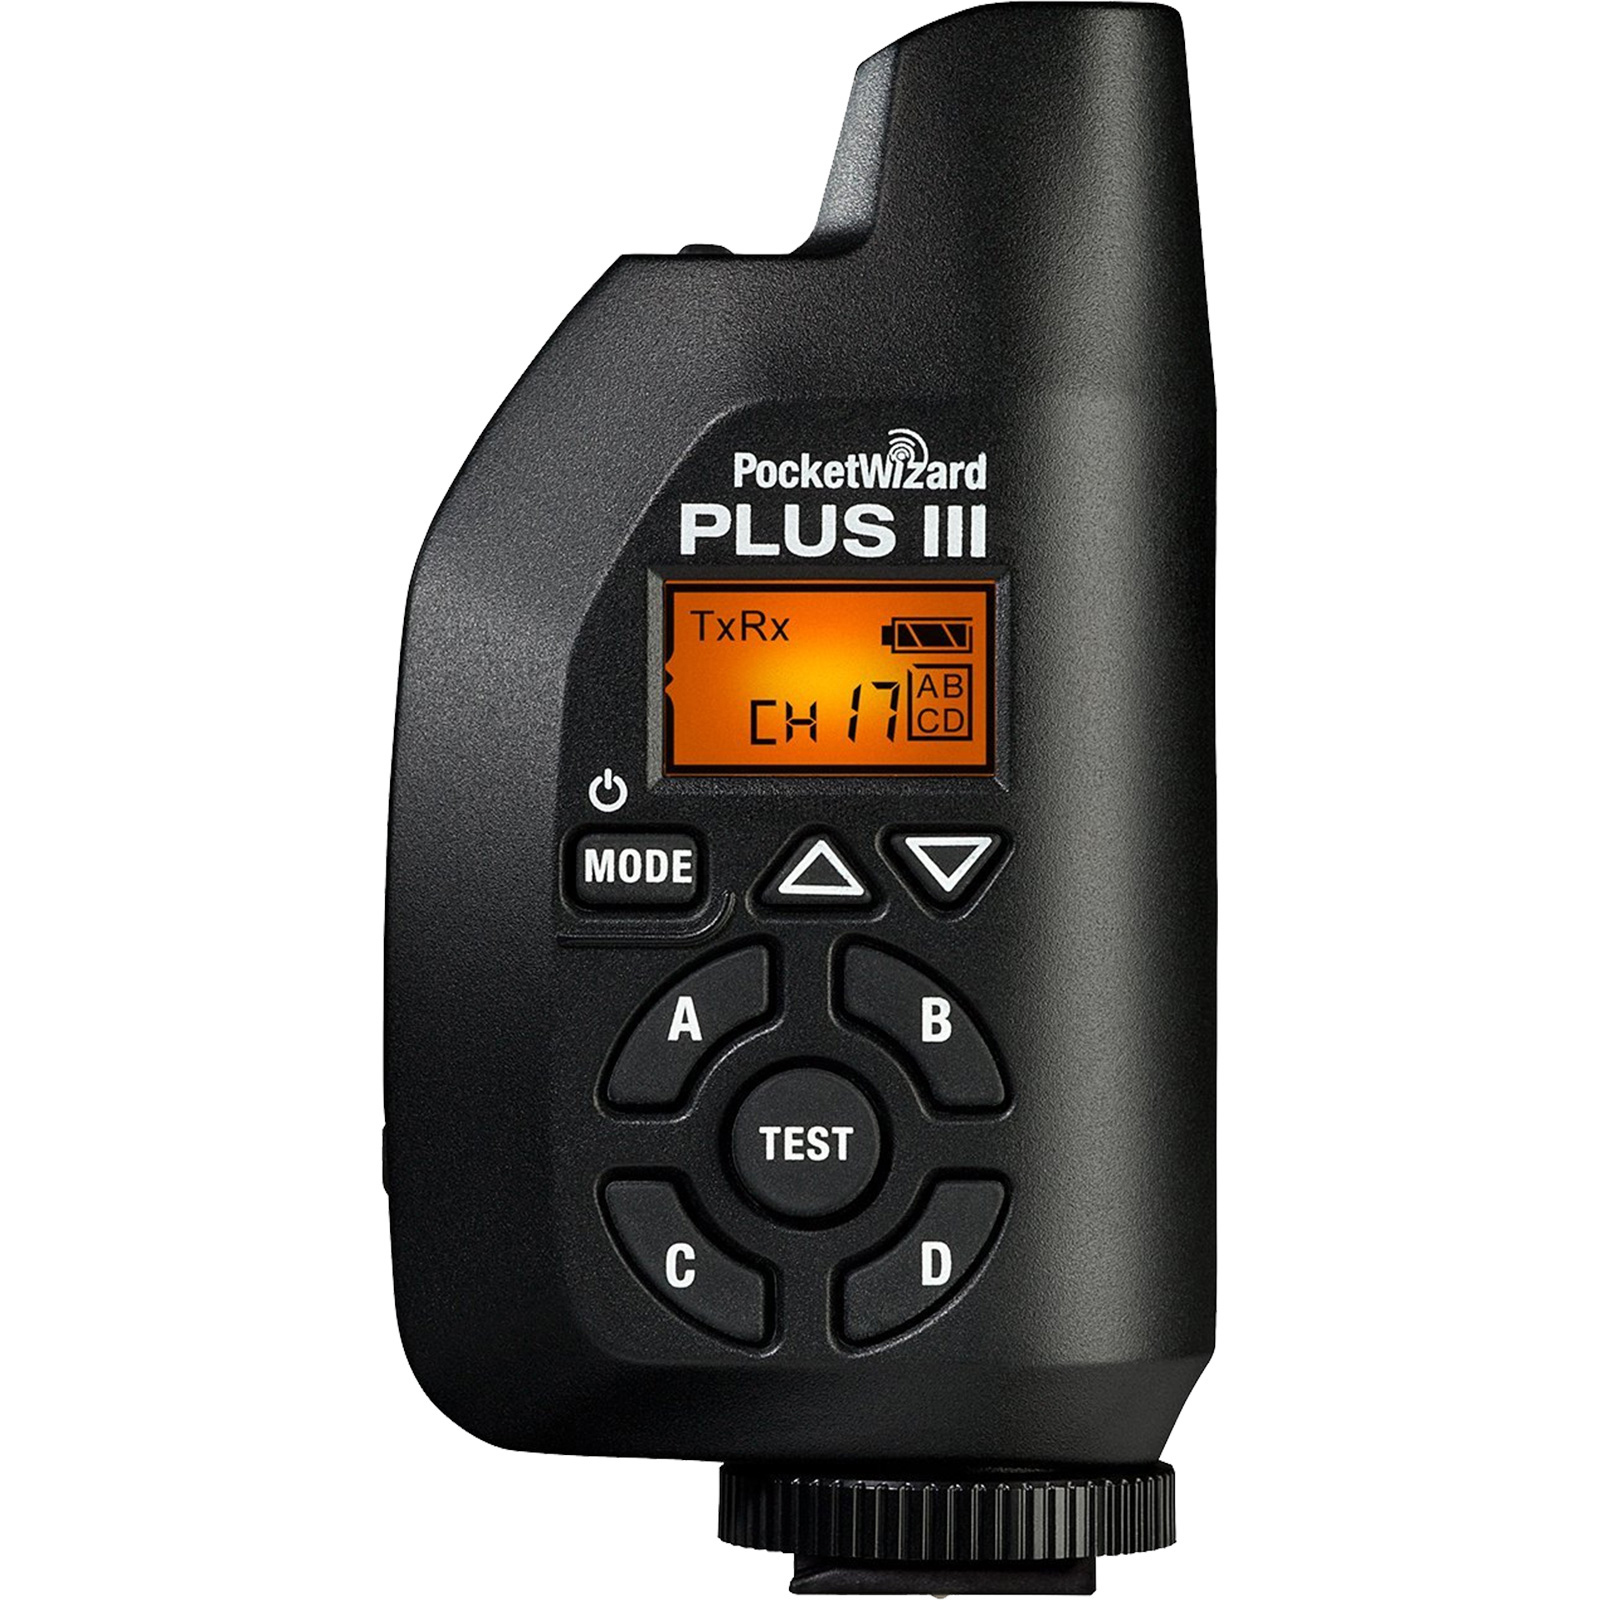 Pocket-Wizard I Wireless Transceiver Reliably Trigger Lig...